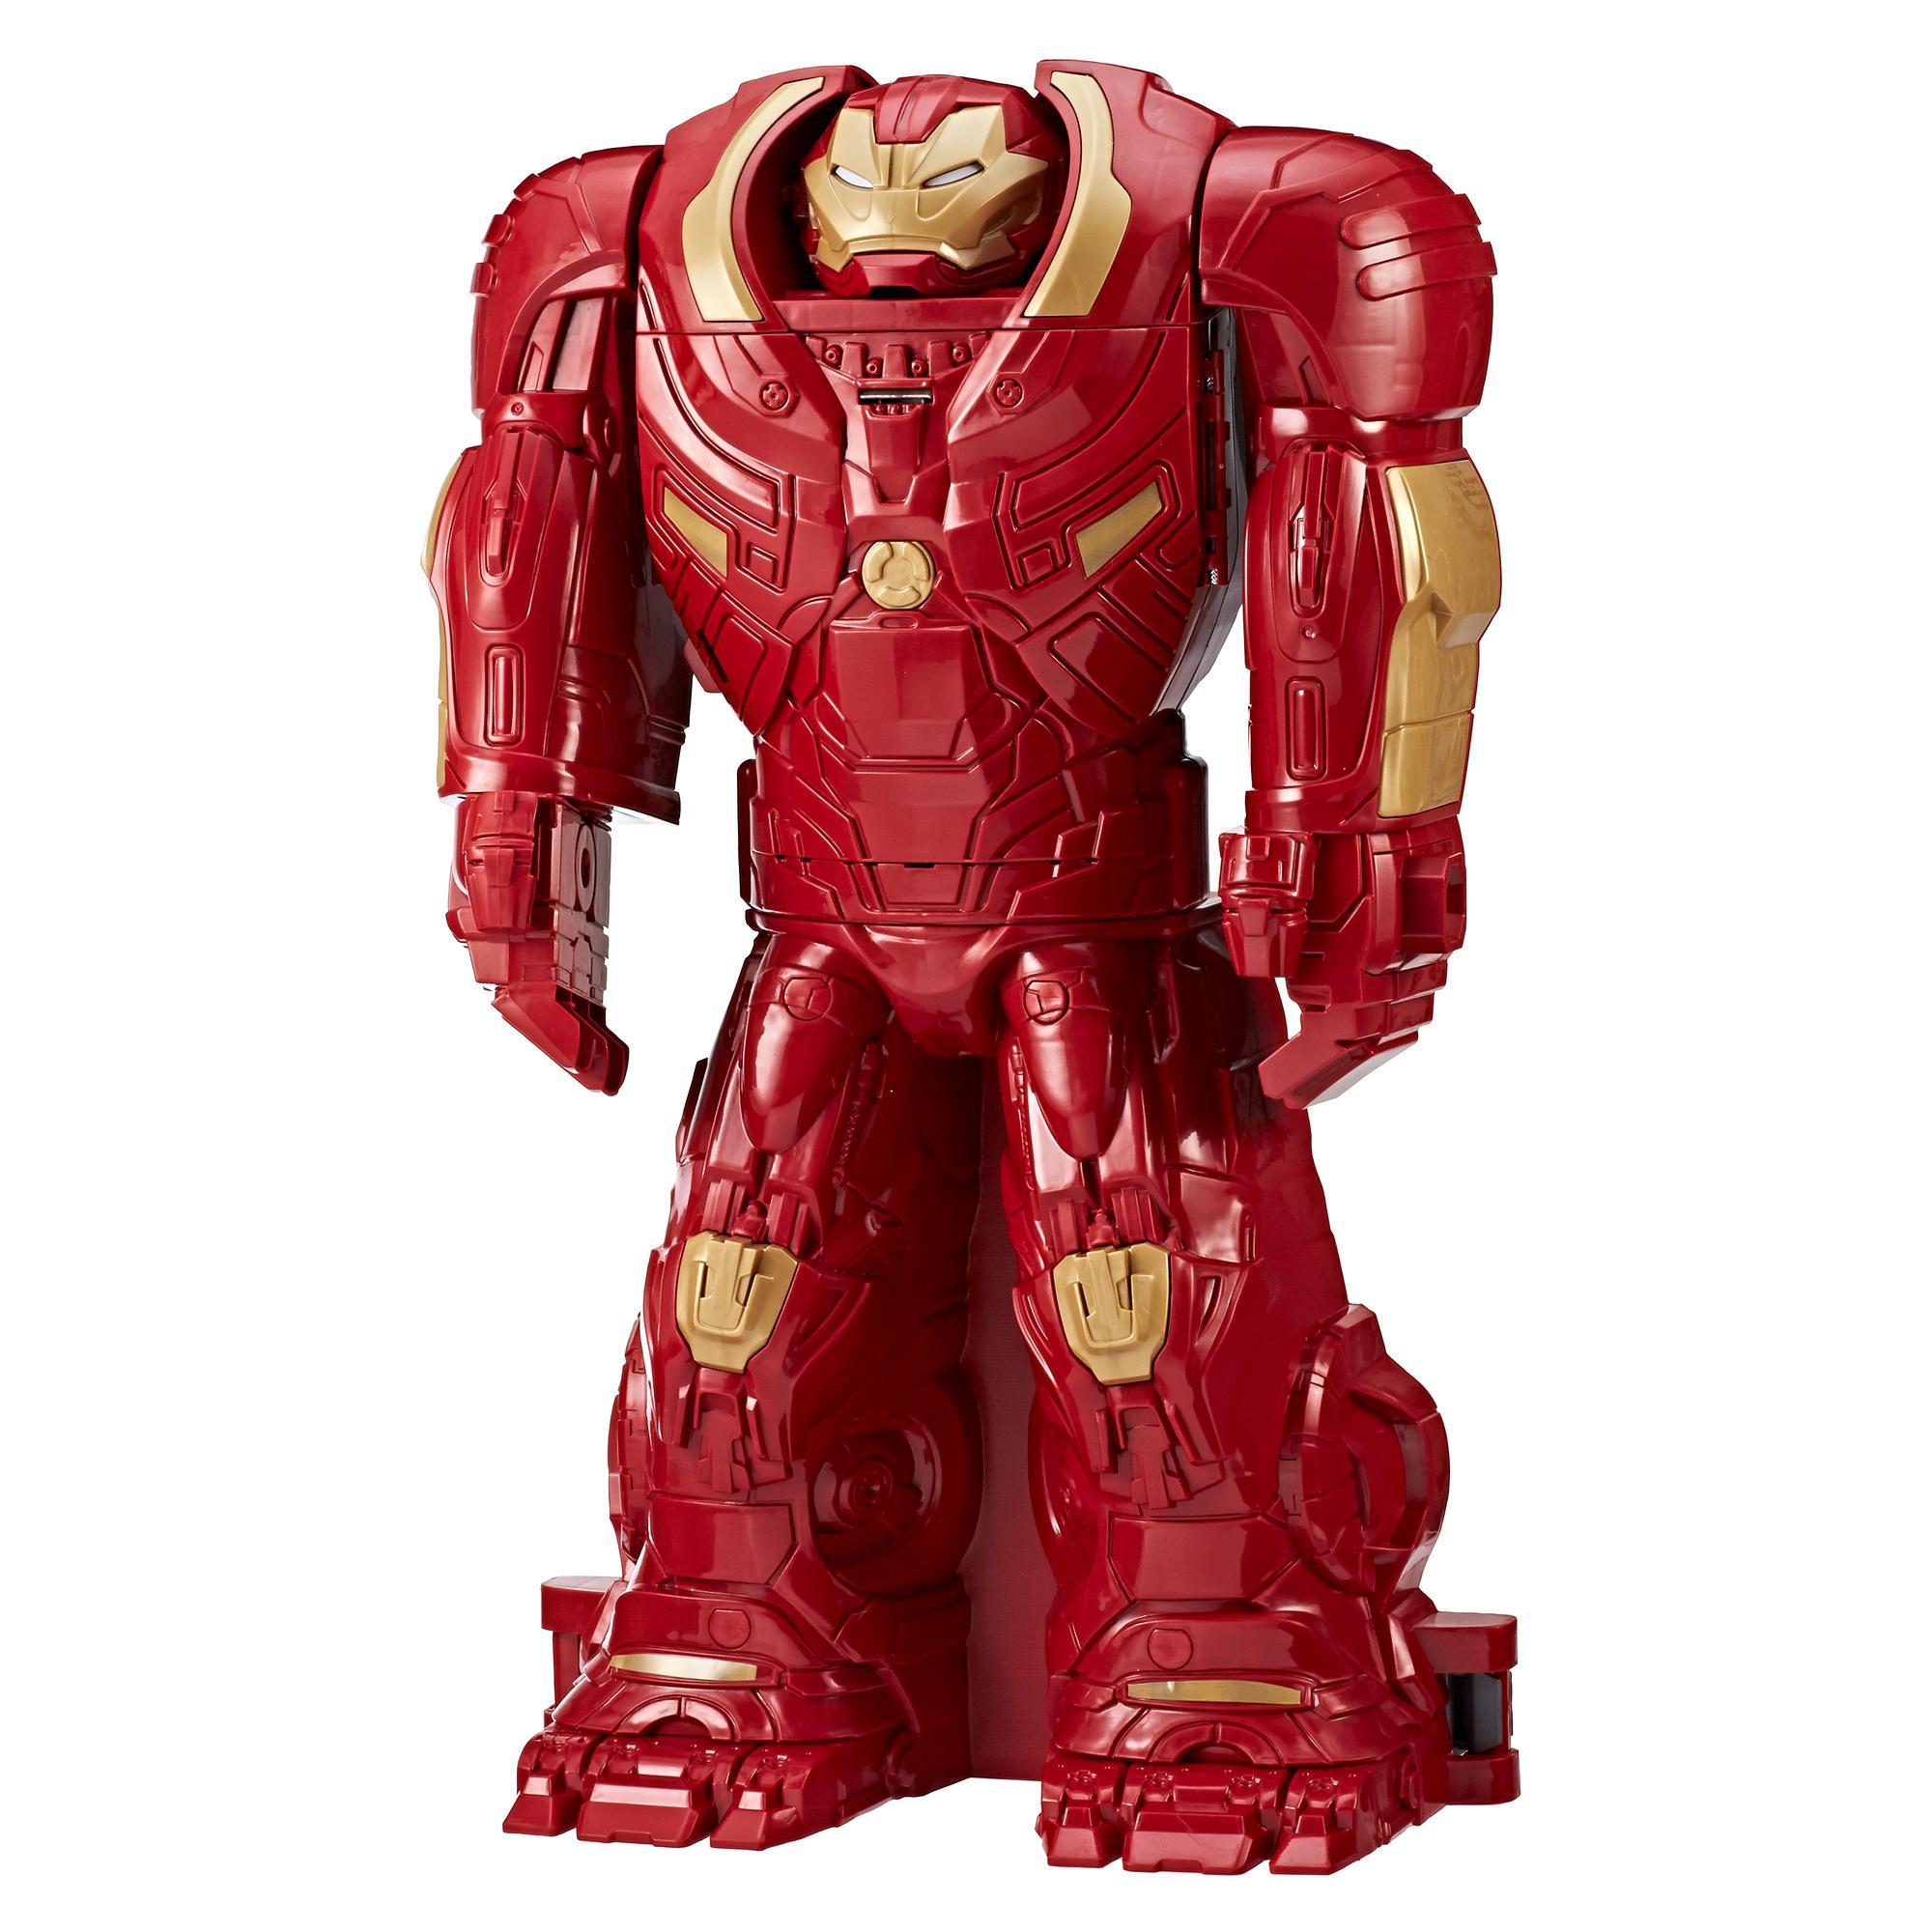 Marvel Avengers: Guerra del Infinito - Juego Cuartel general Hulkbuster